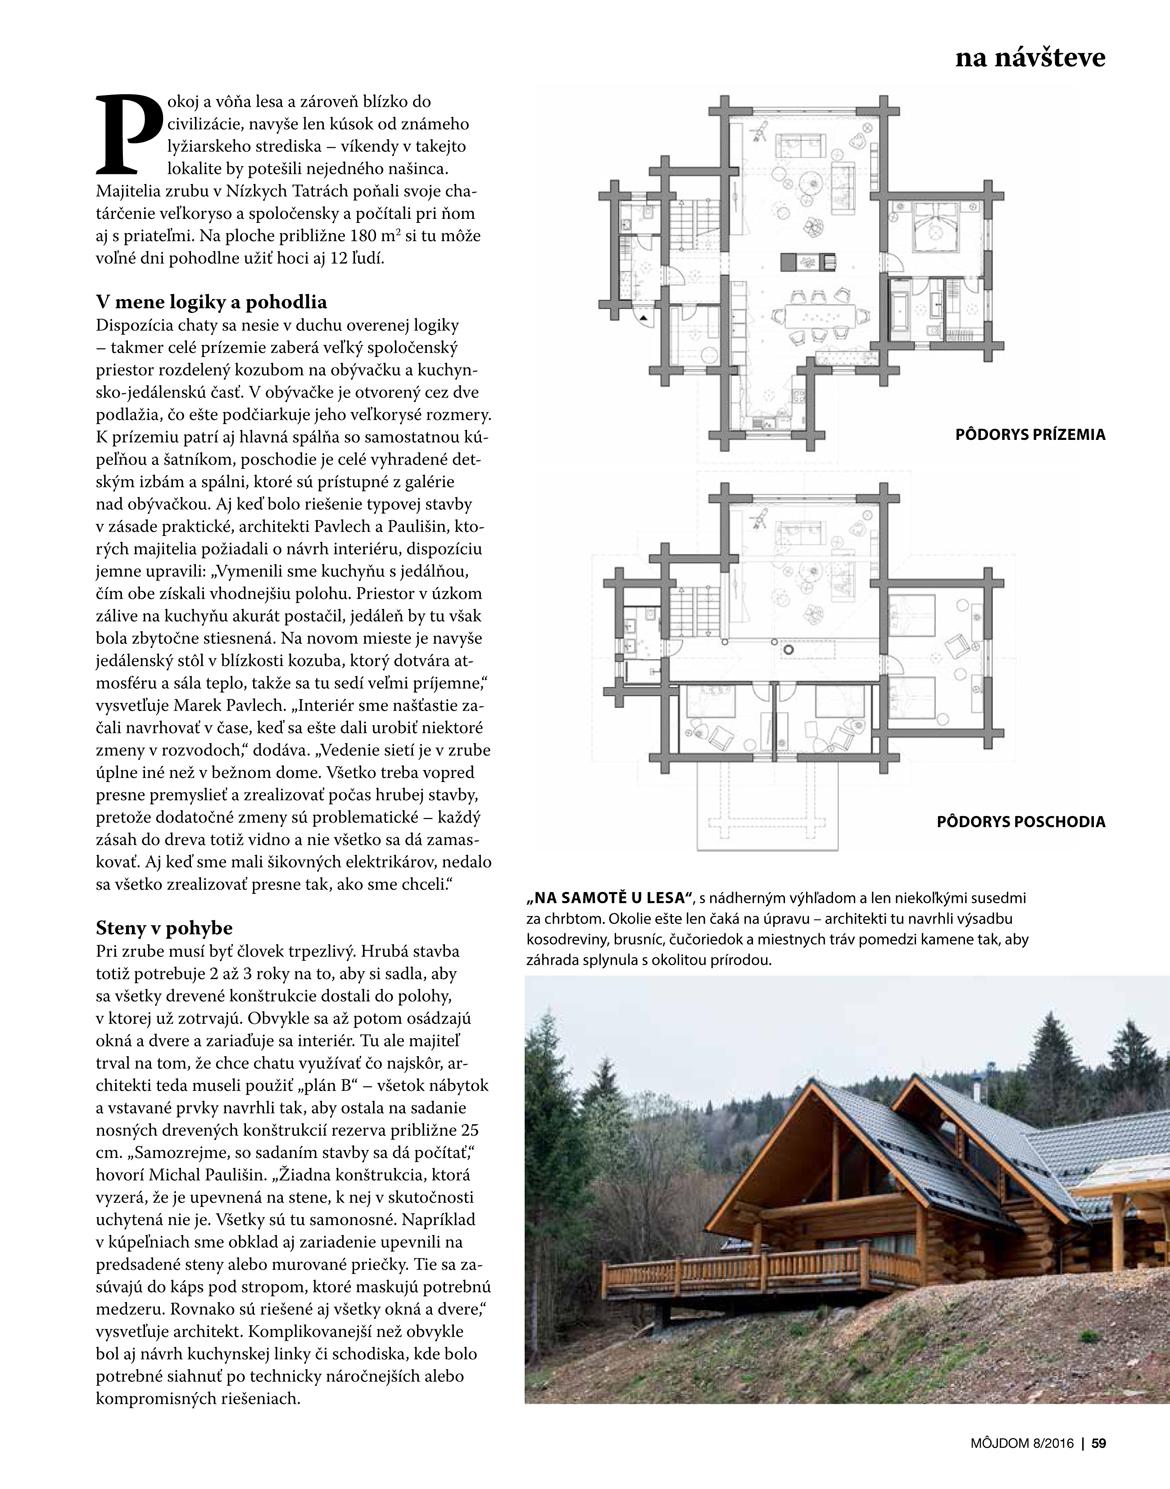 004-interier-zrub-tale-mojdom-pavlech-architekti